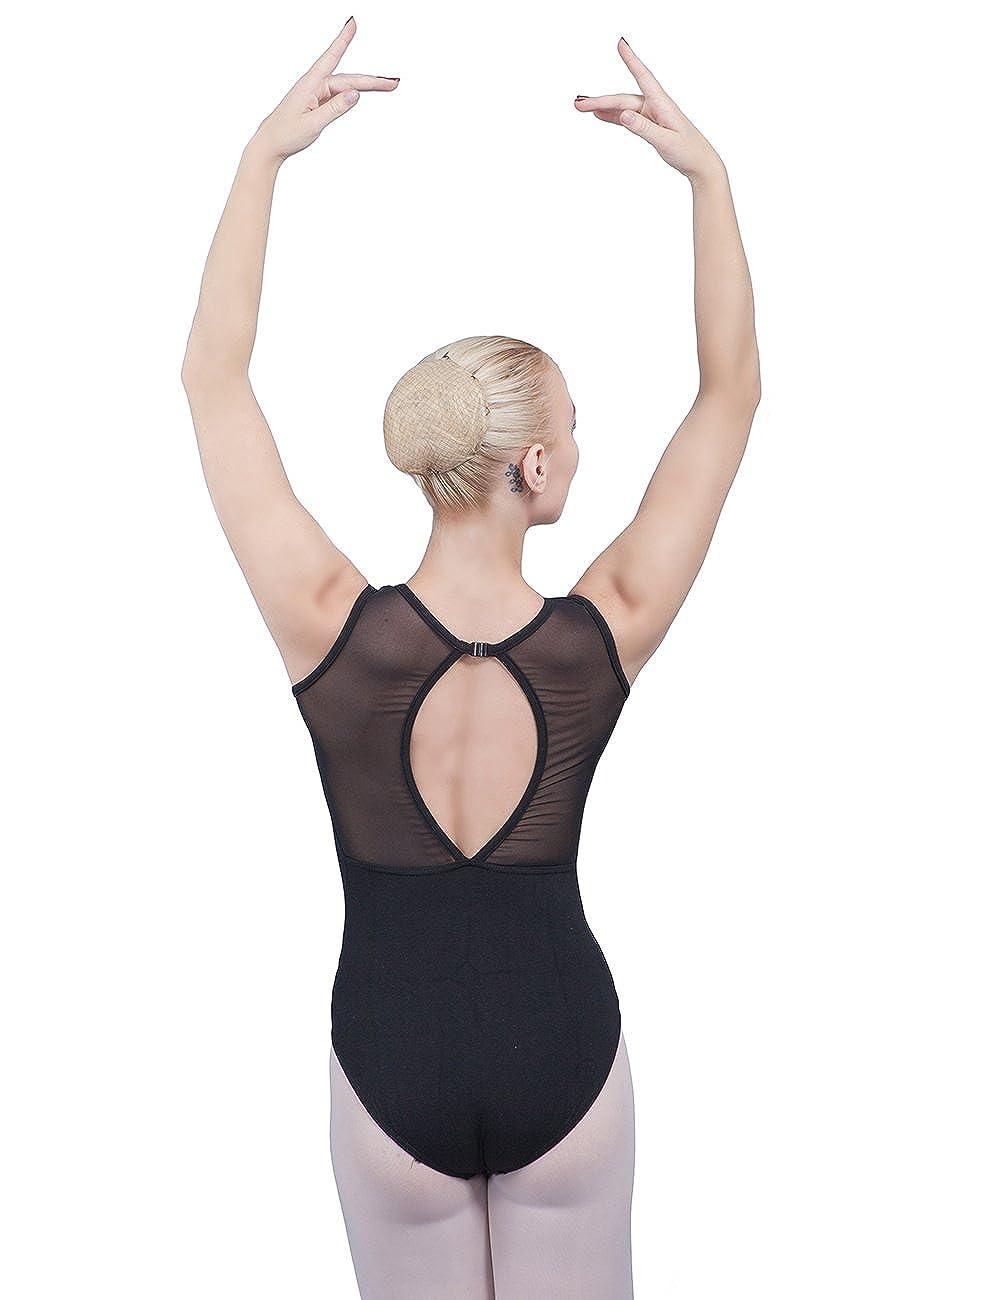 Dance Favourite Leotards for Womens and Girls Gymnastics Black 01D0048